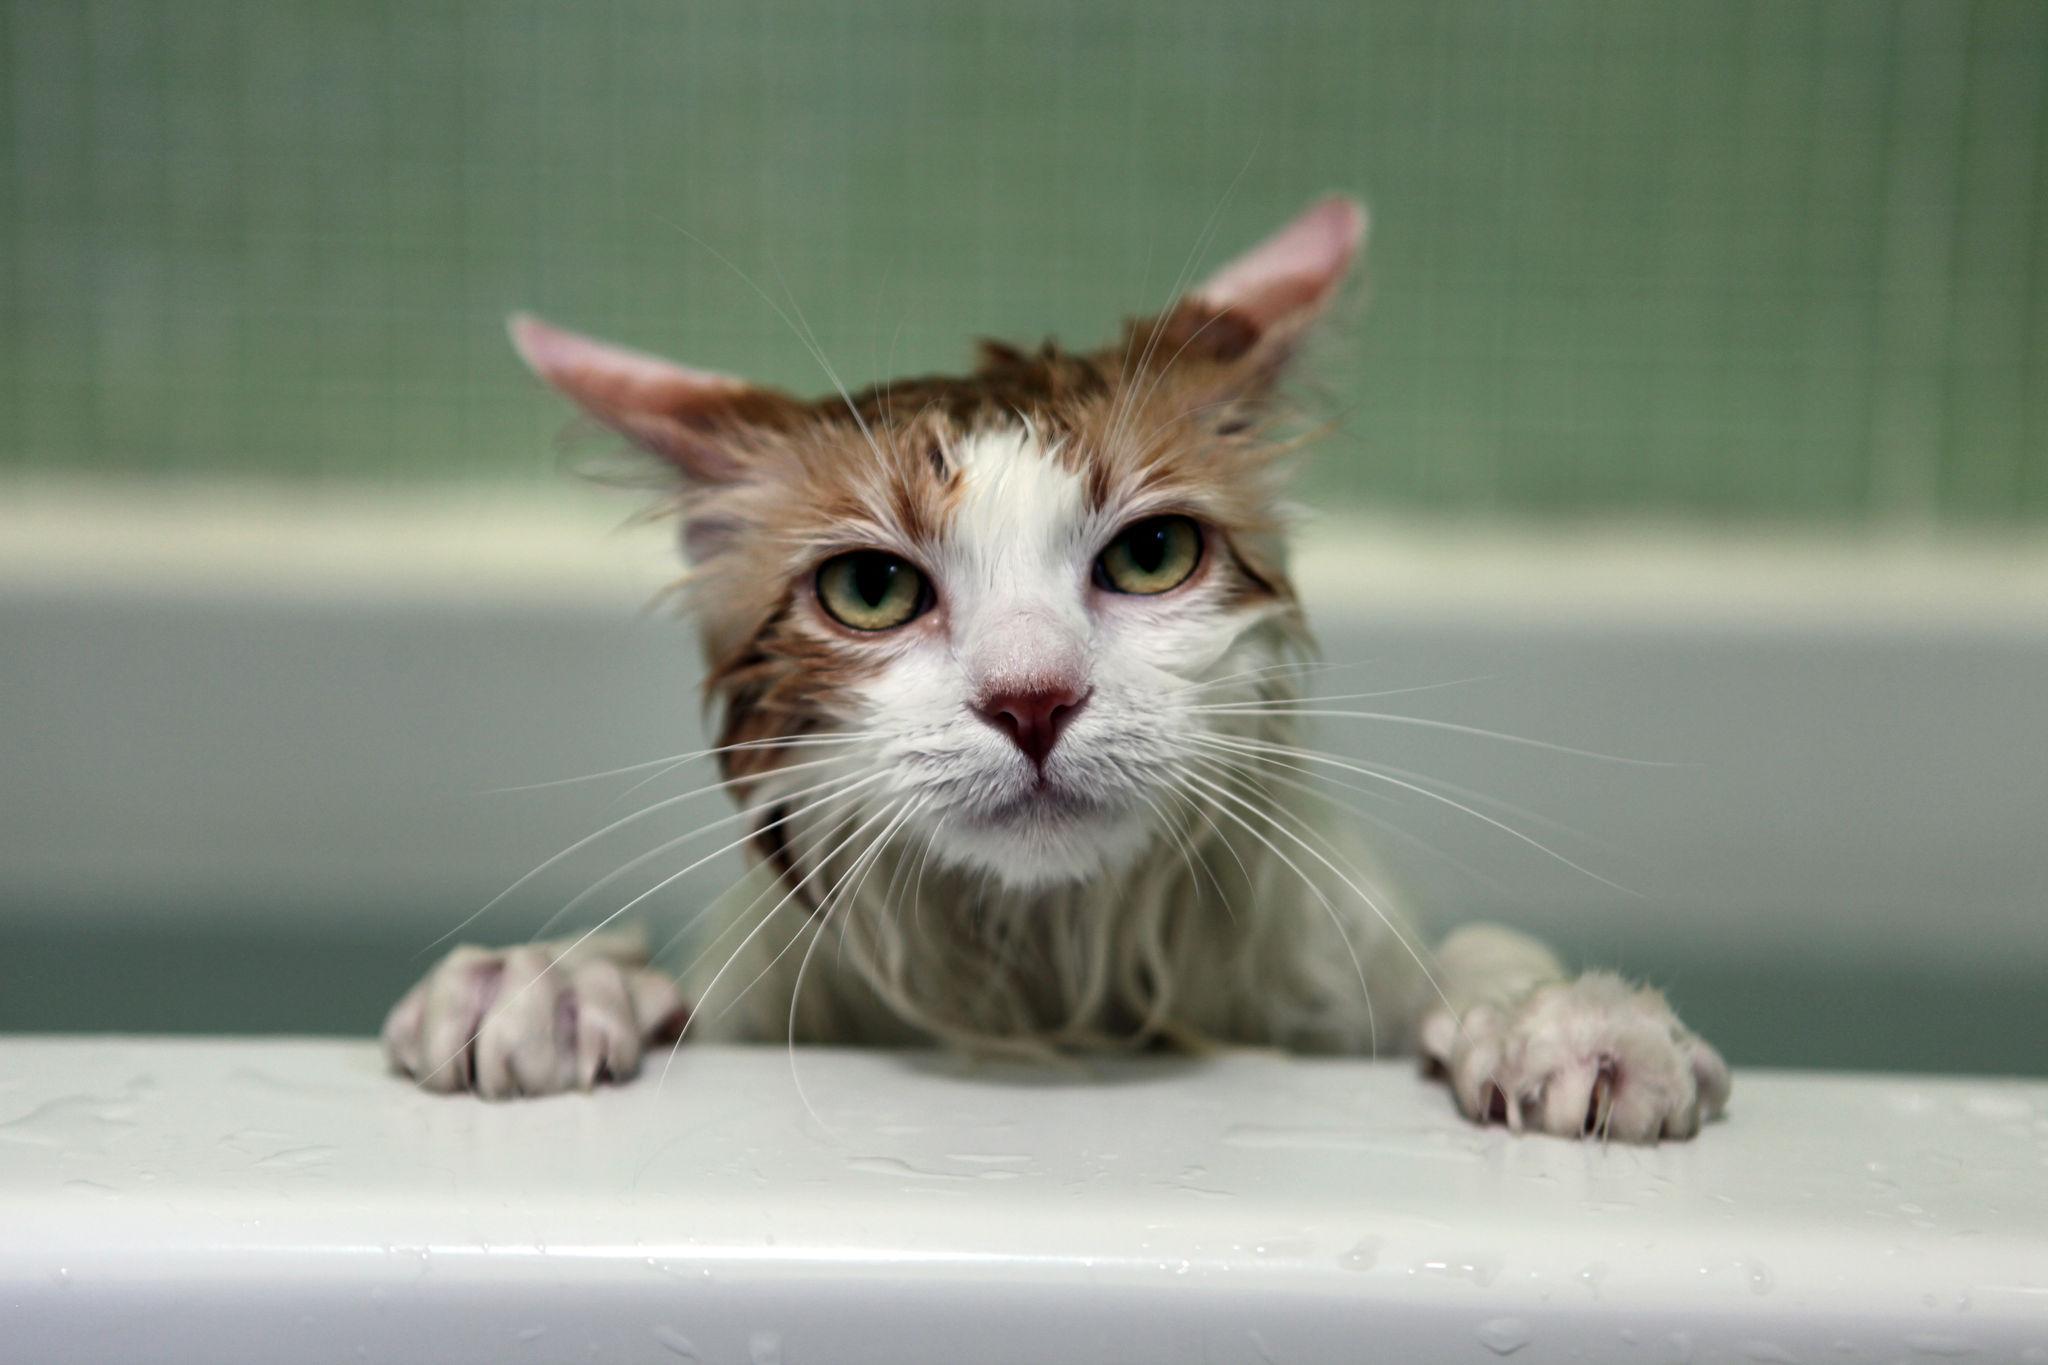 Sedating a cat to groom